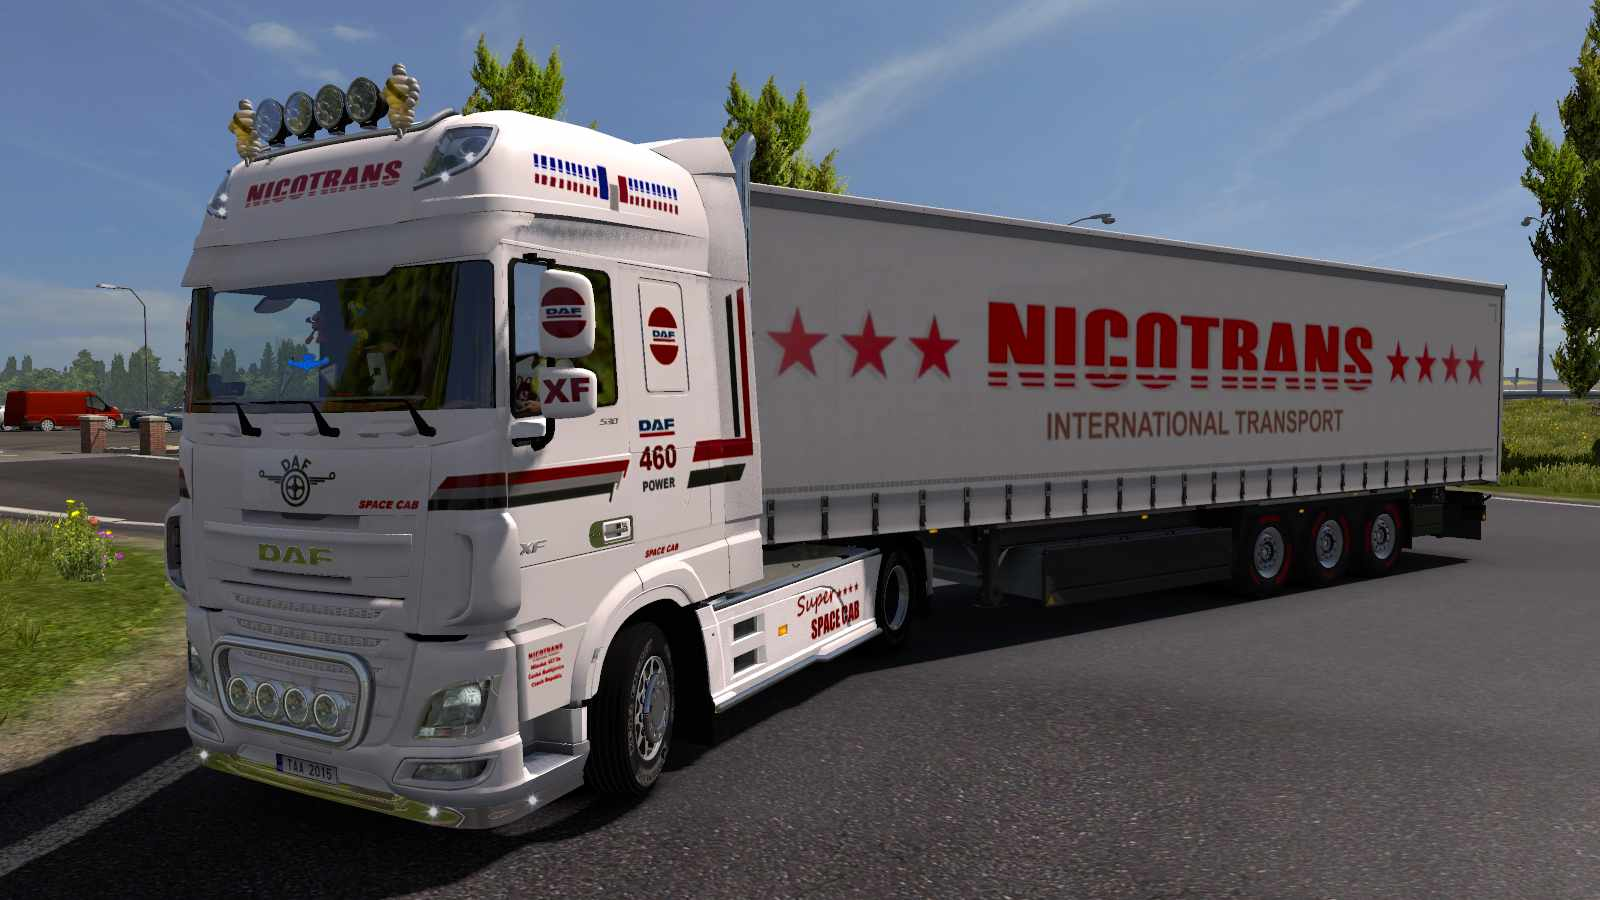 Combo Daf E6 Nicotrans /upgrade/